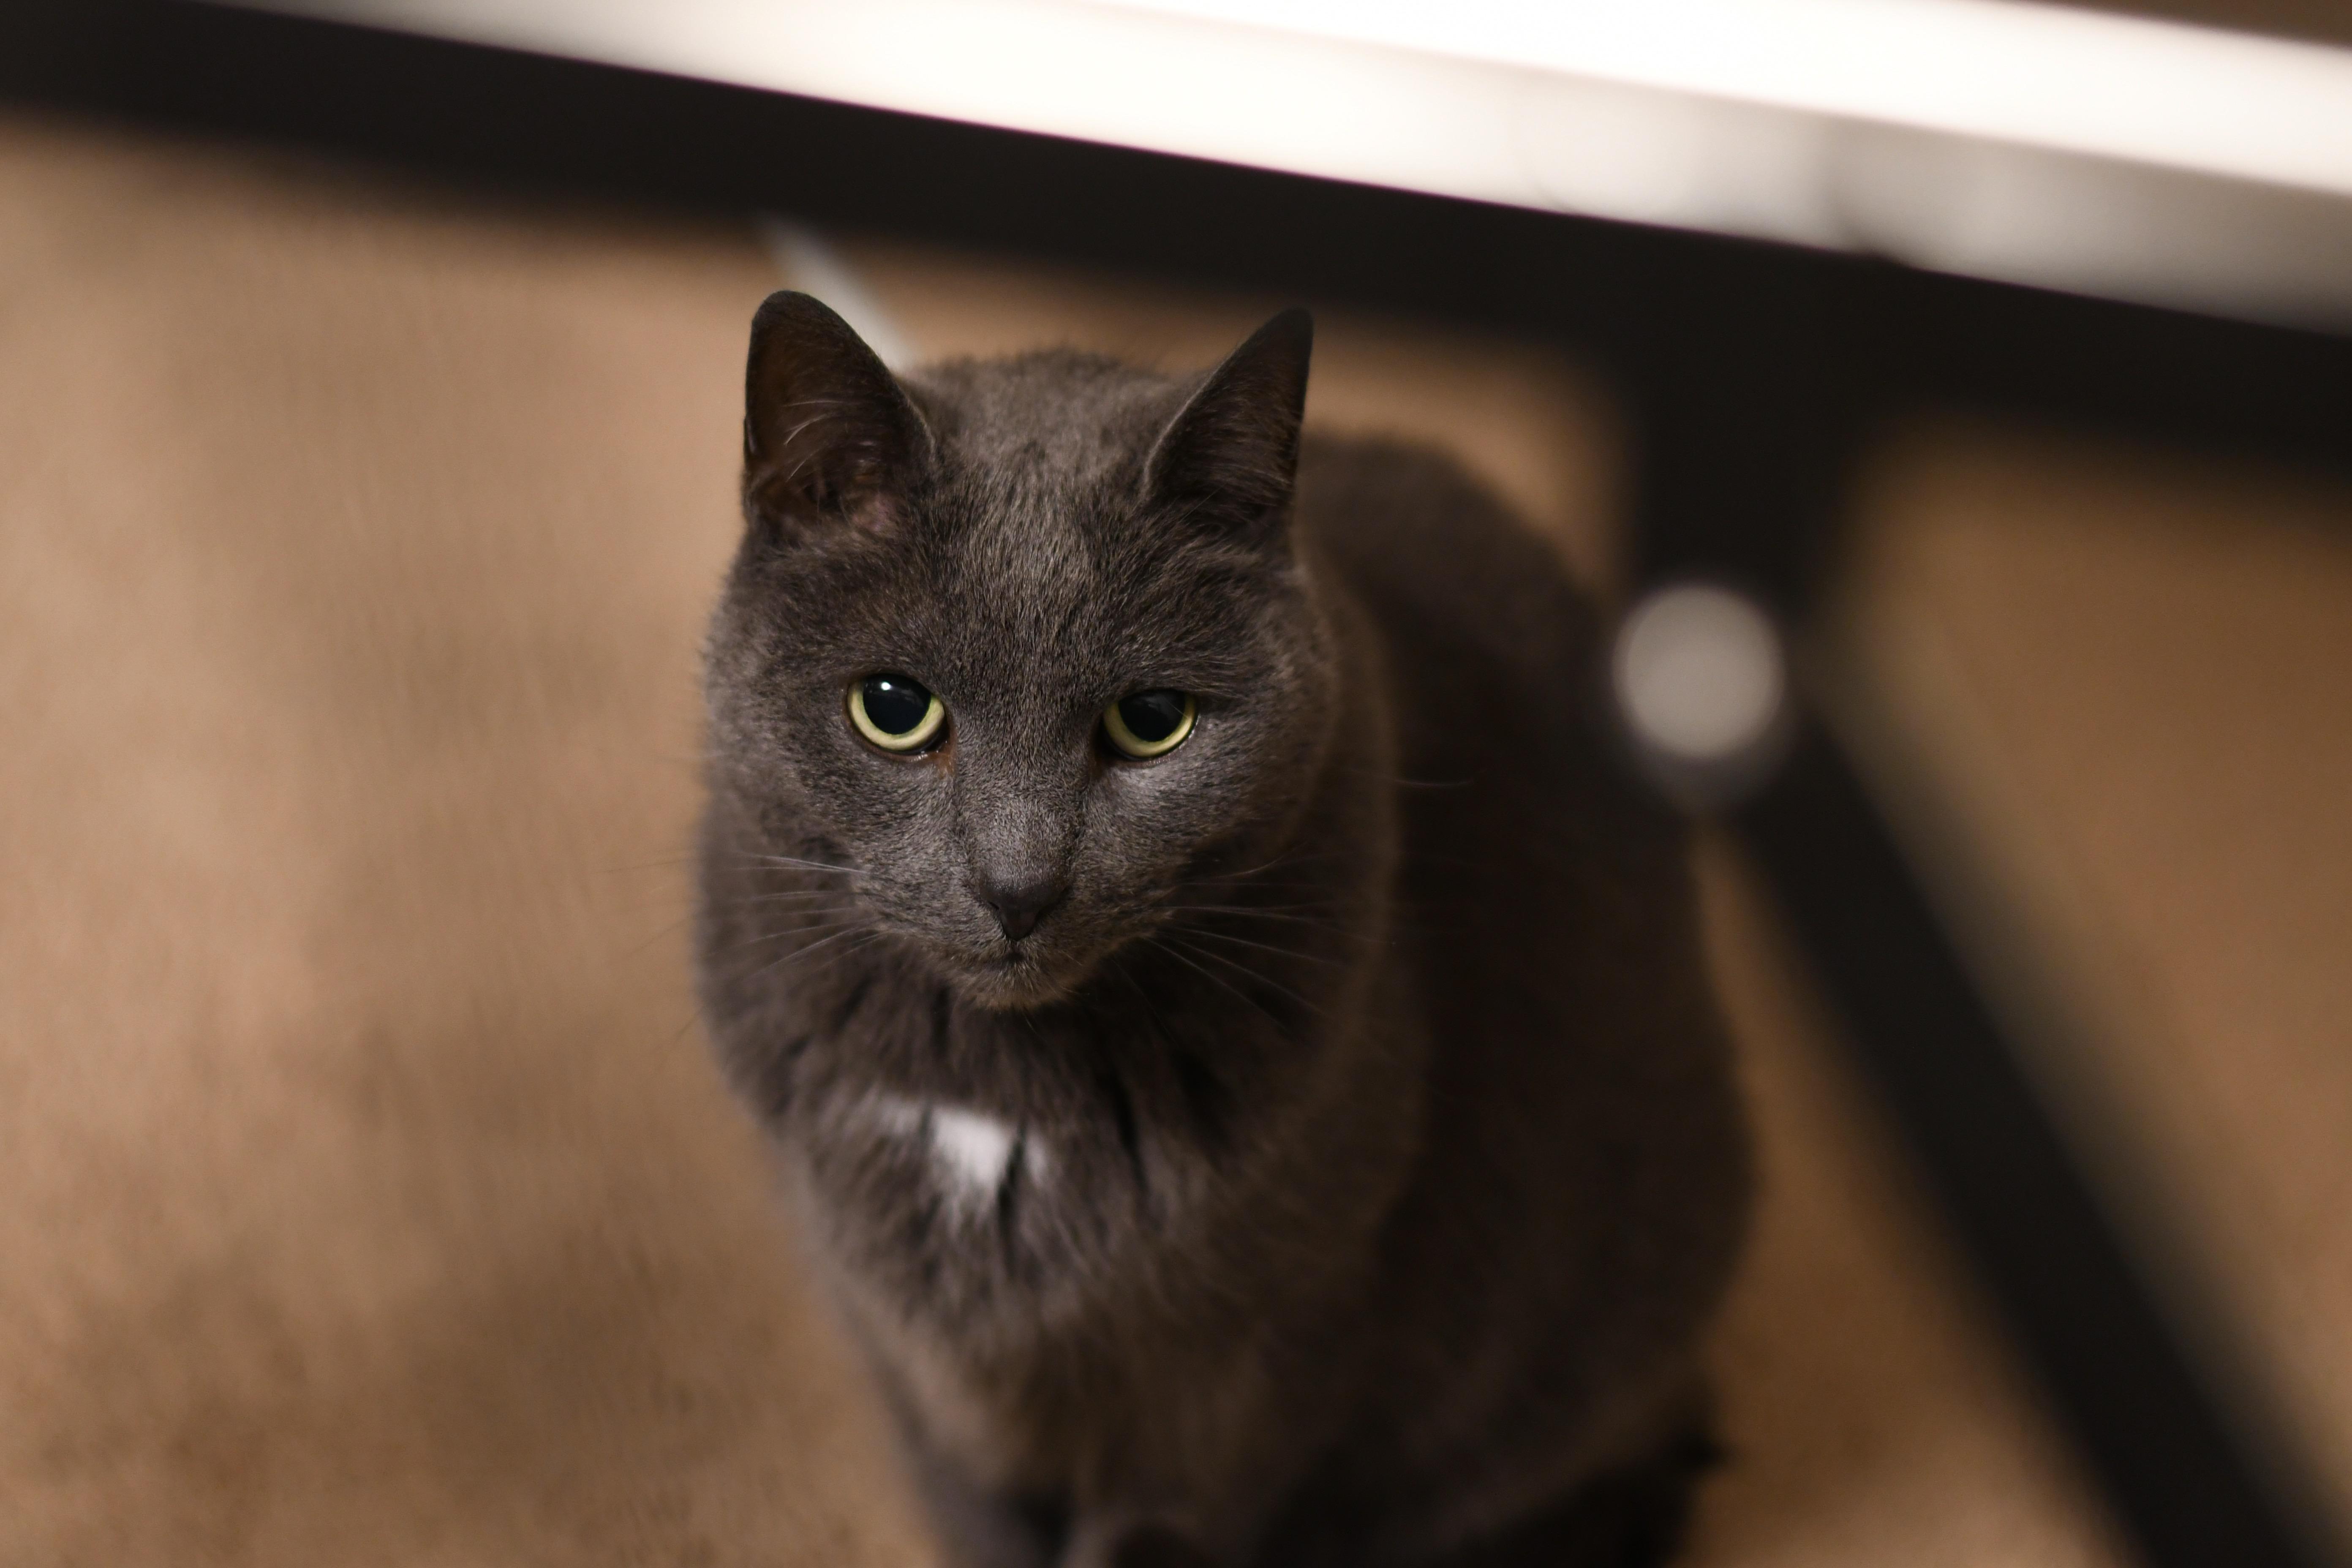 A top down portrait of a grey cat